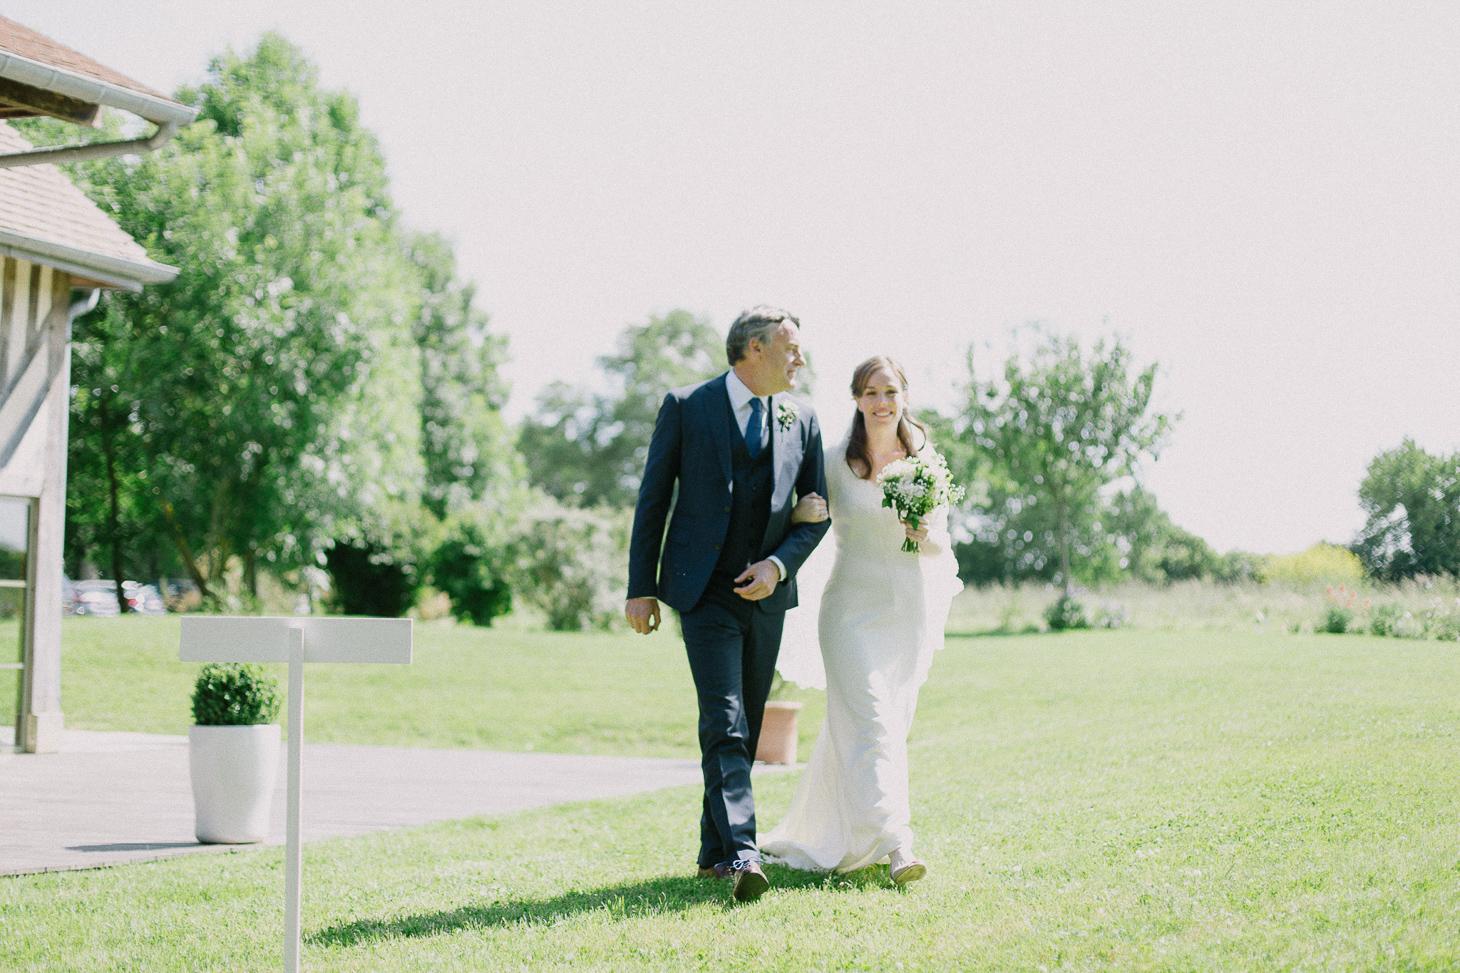 photographe-mariage-champ-de-launay-normandie-00032